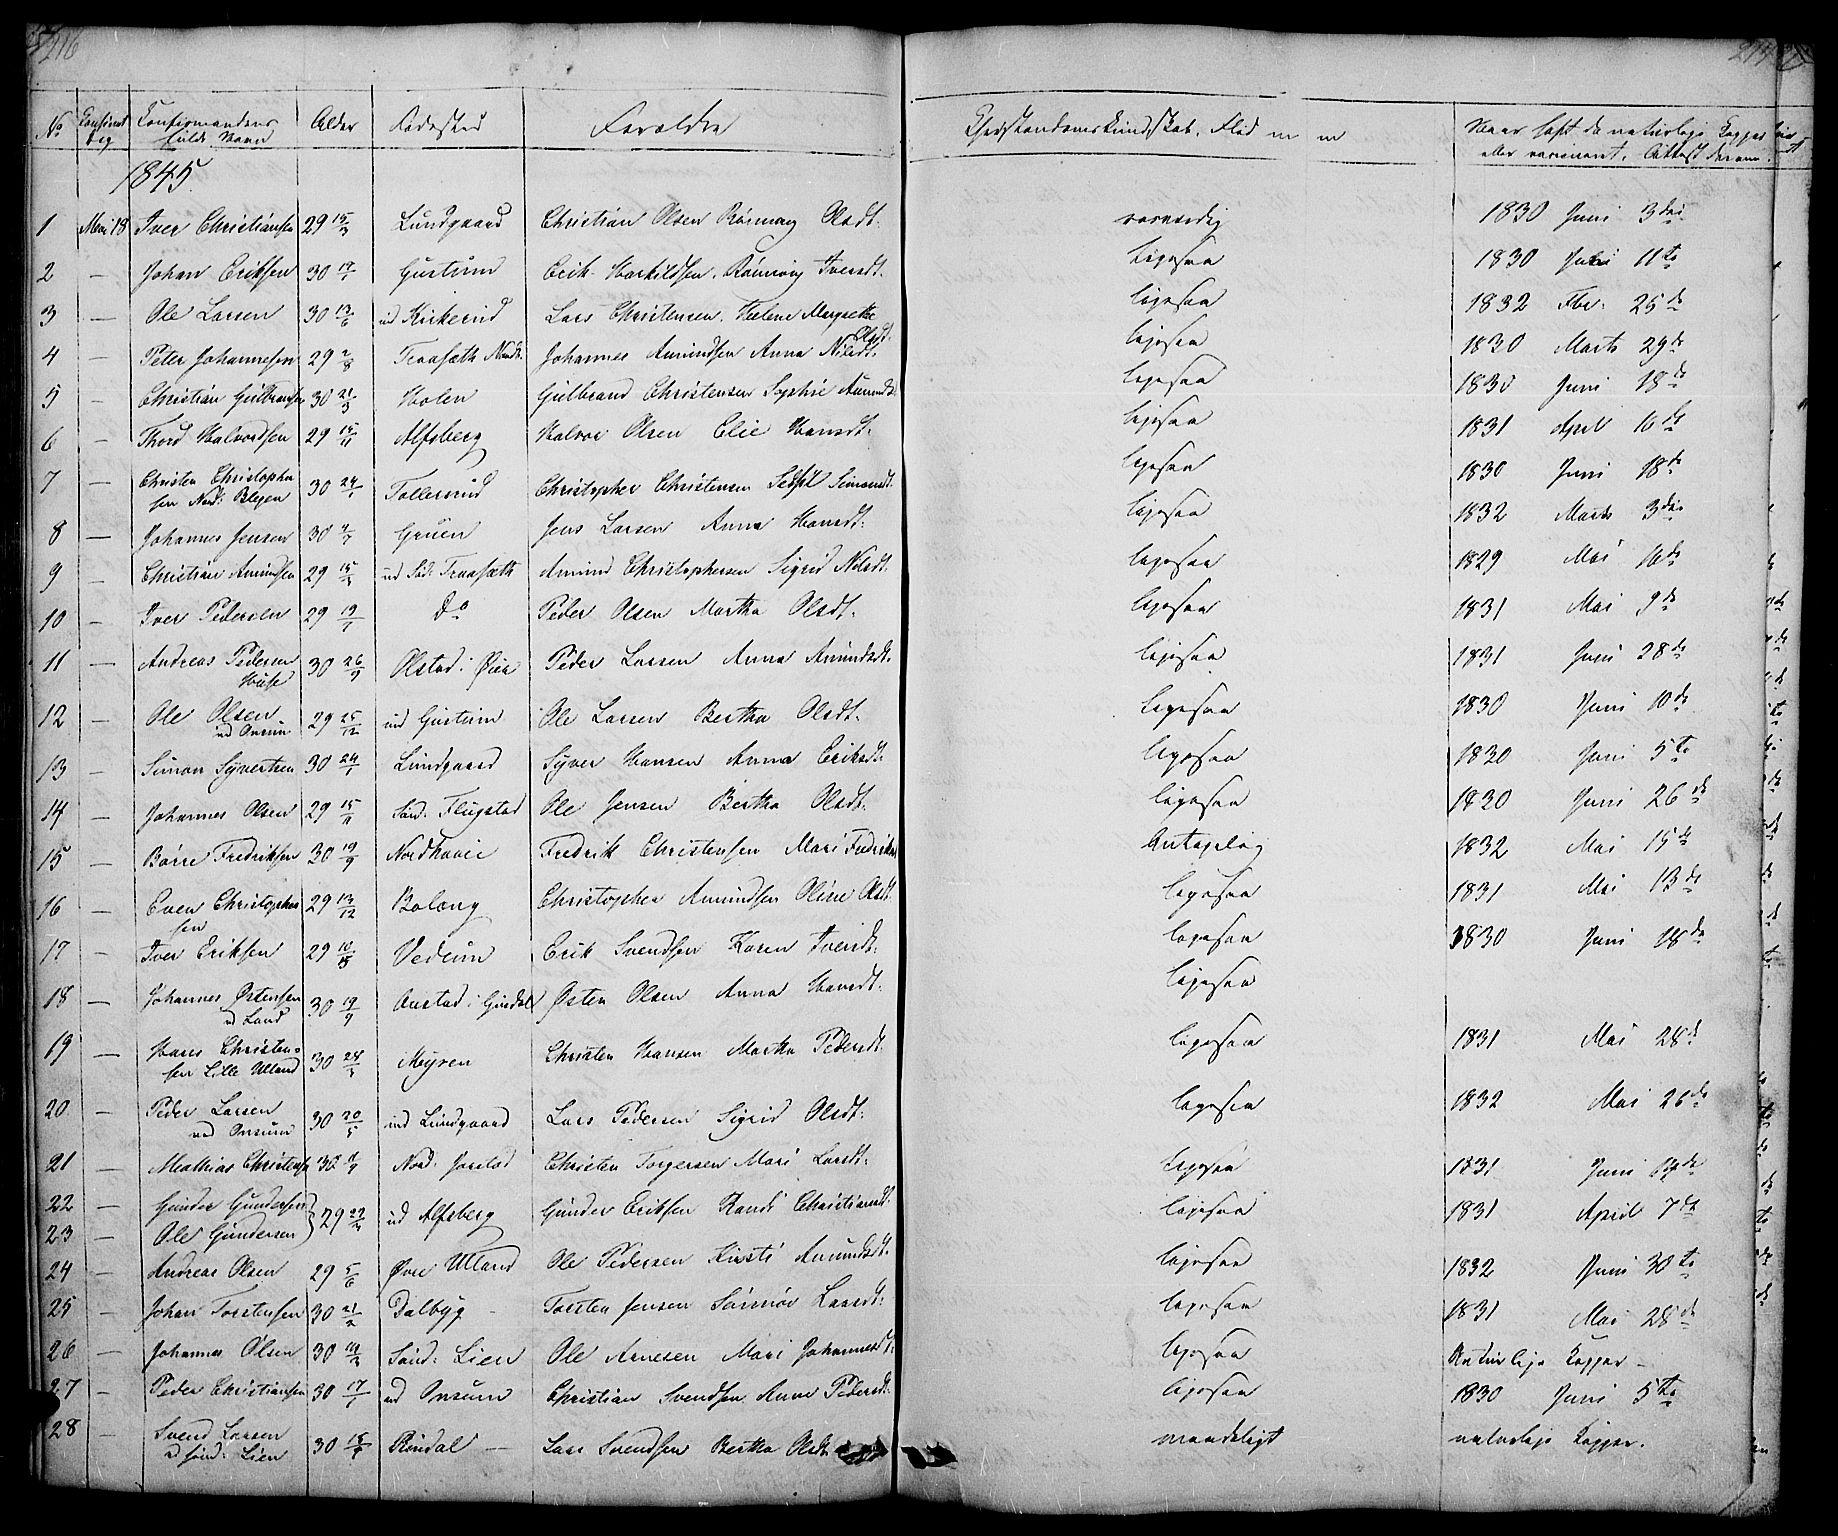 SAH, Fåberg prestekontor, Klokkerbok nr. 5, 1837-1864, s. 216-217